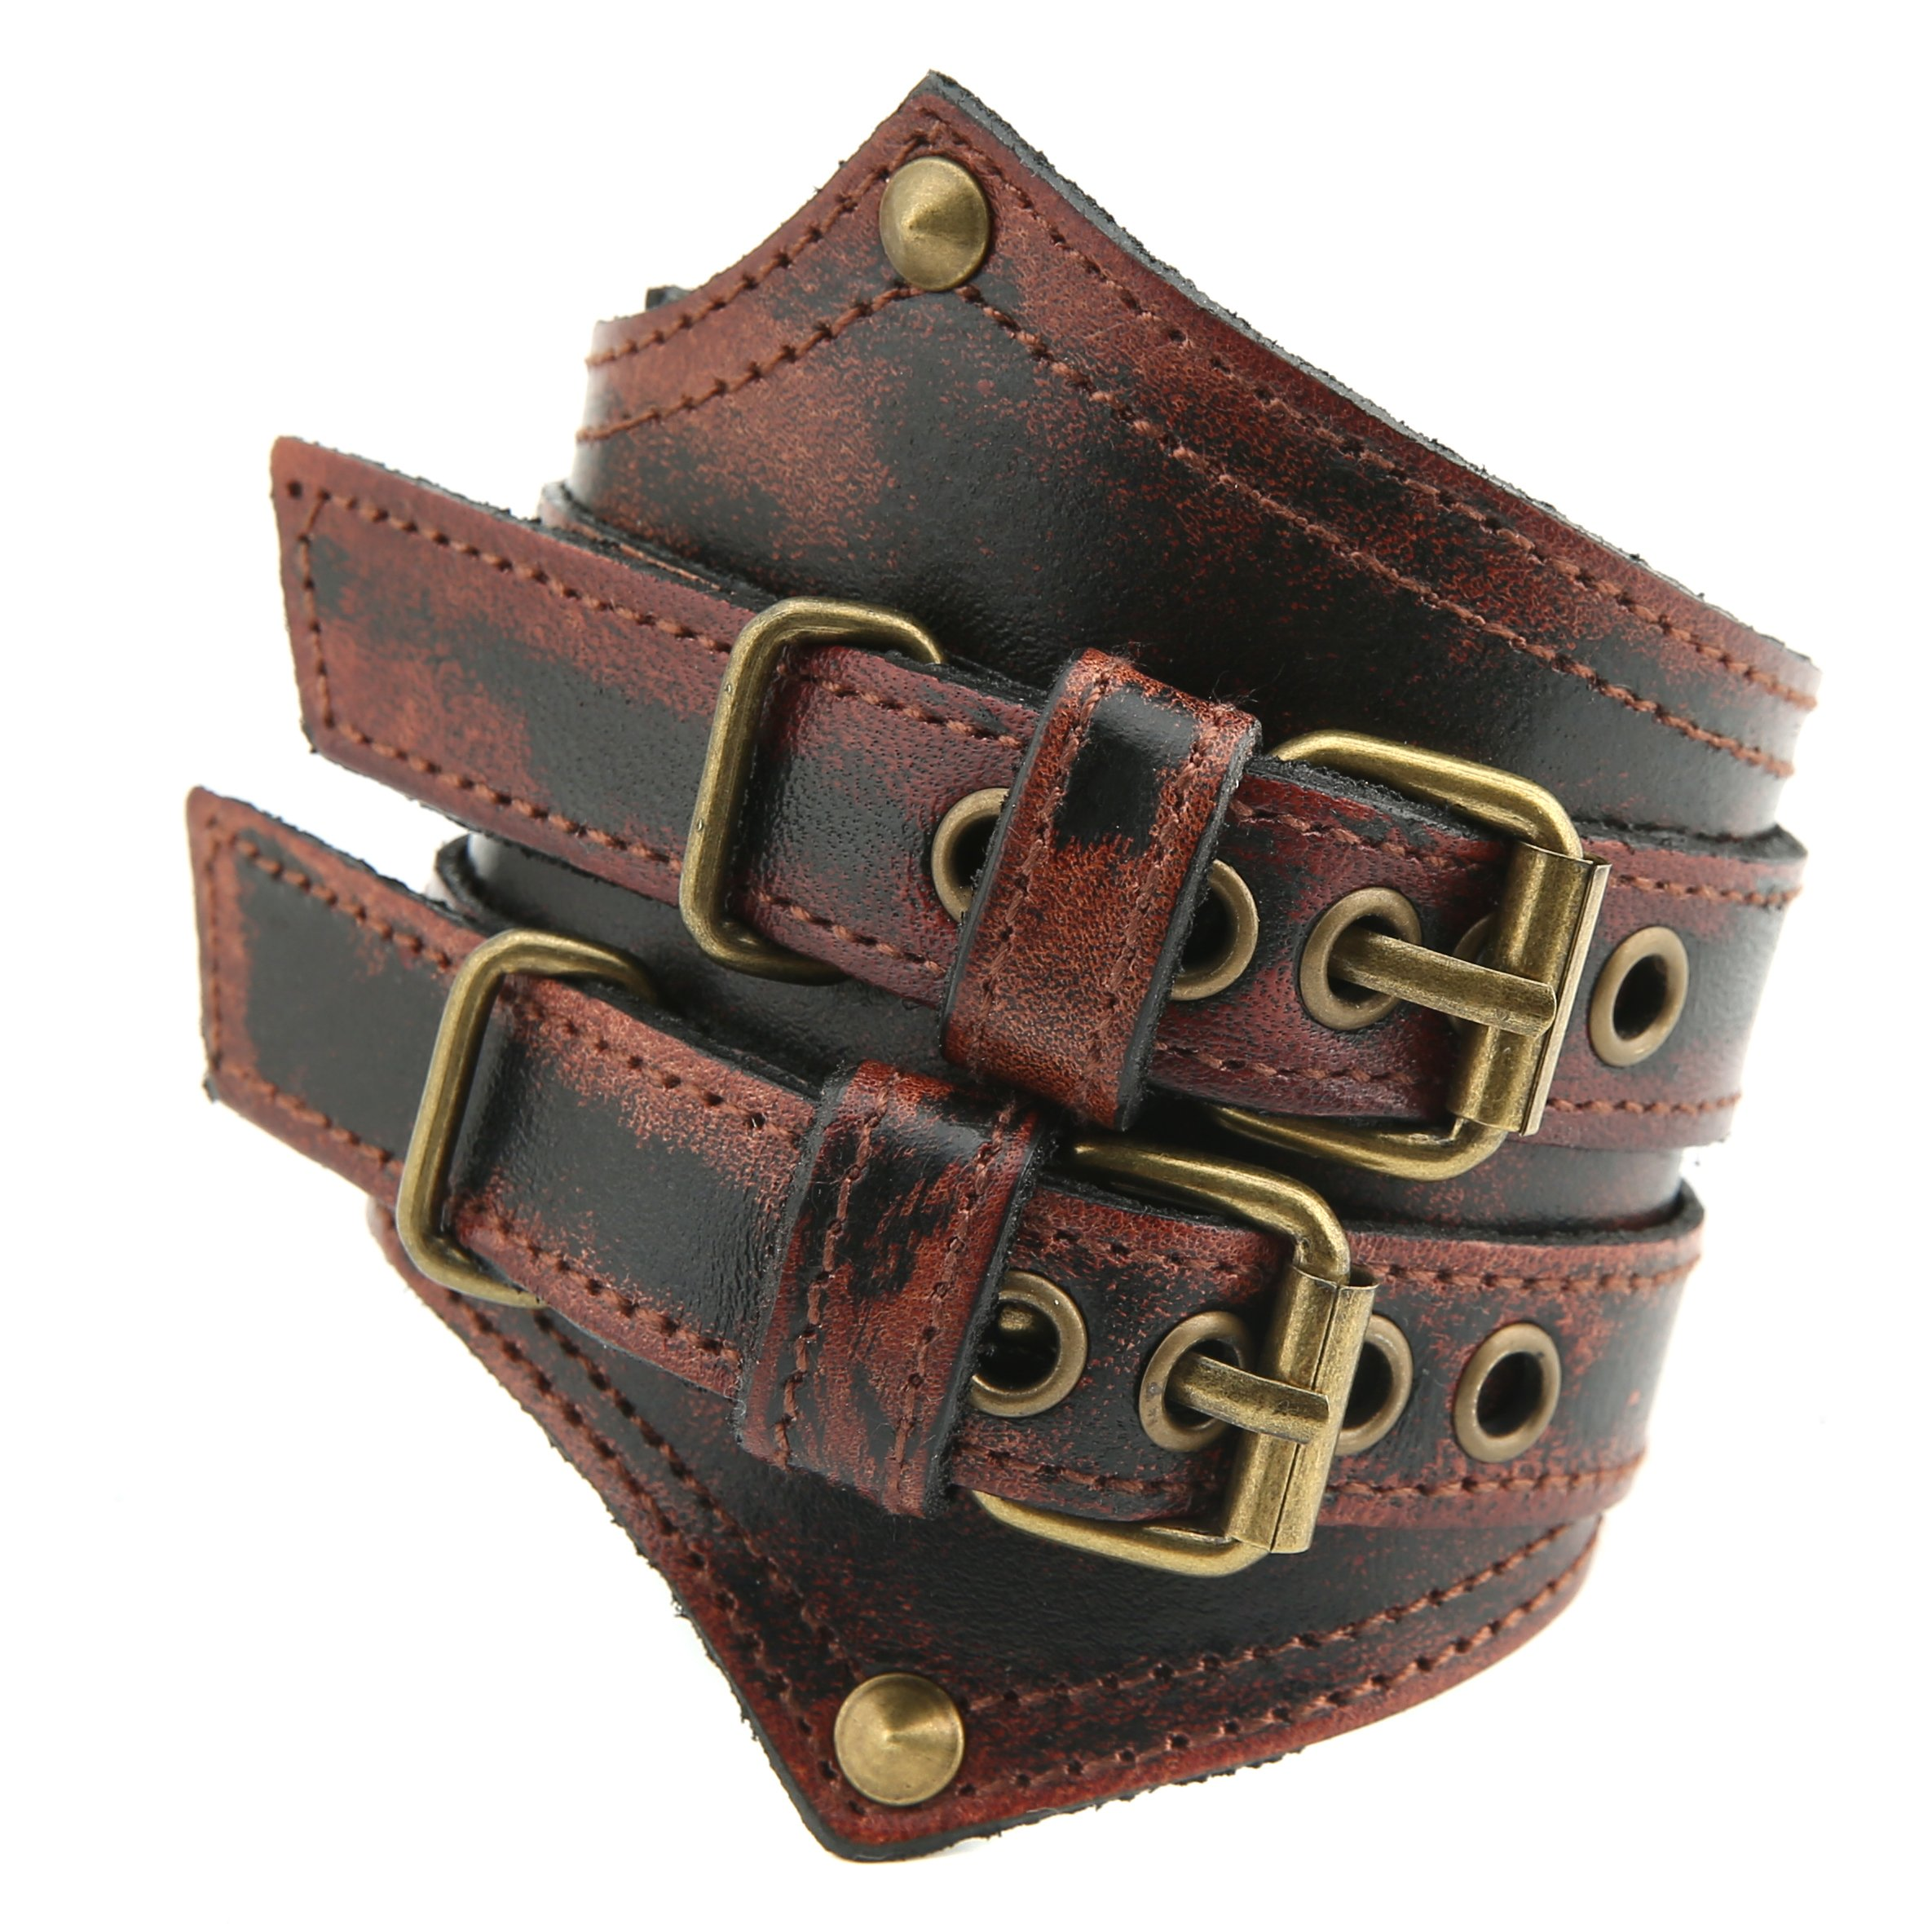 HZMAN Men's Alloy Genuine Leather Belt Leather Buckle Bracelet Cuff Adjustable (Crimson)